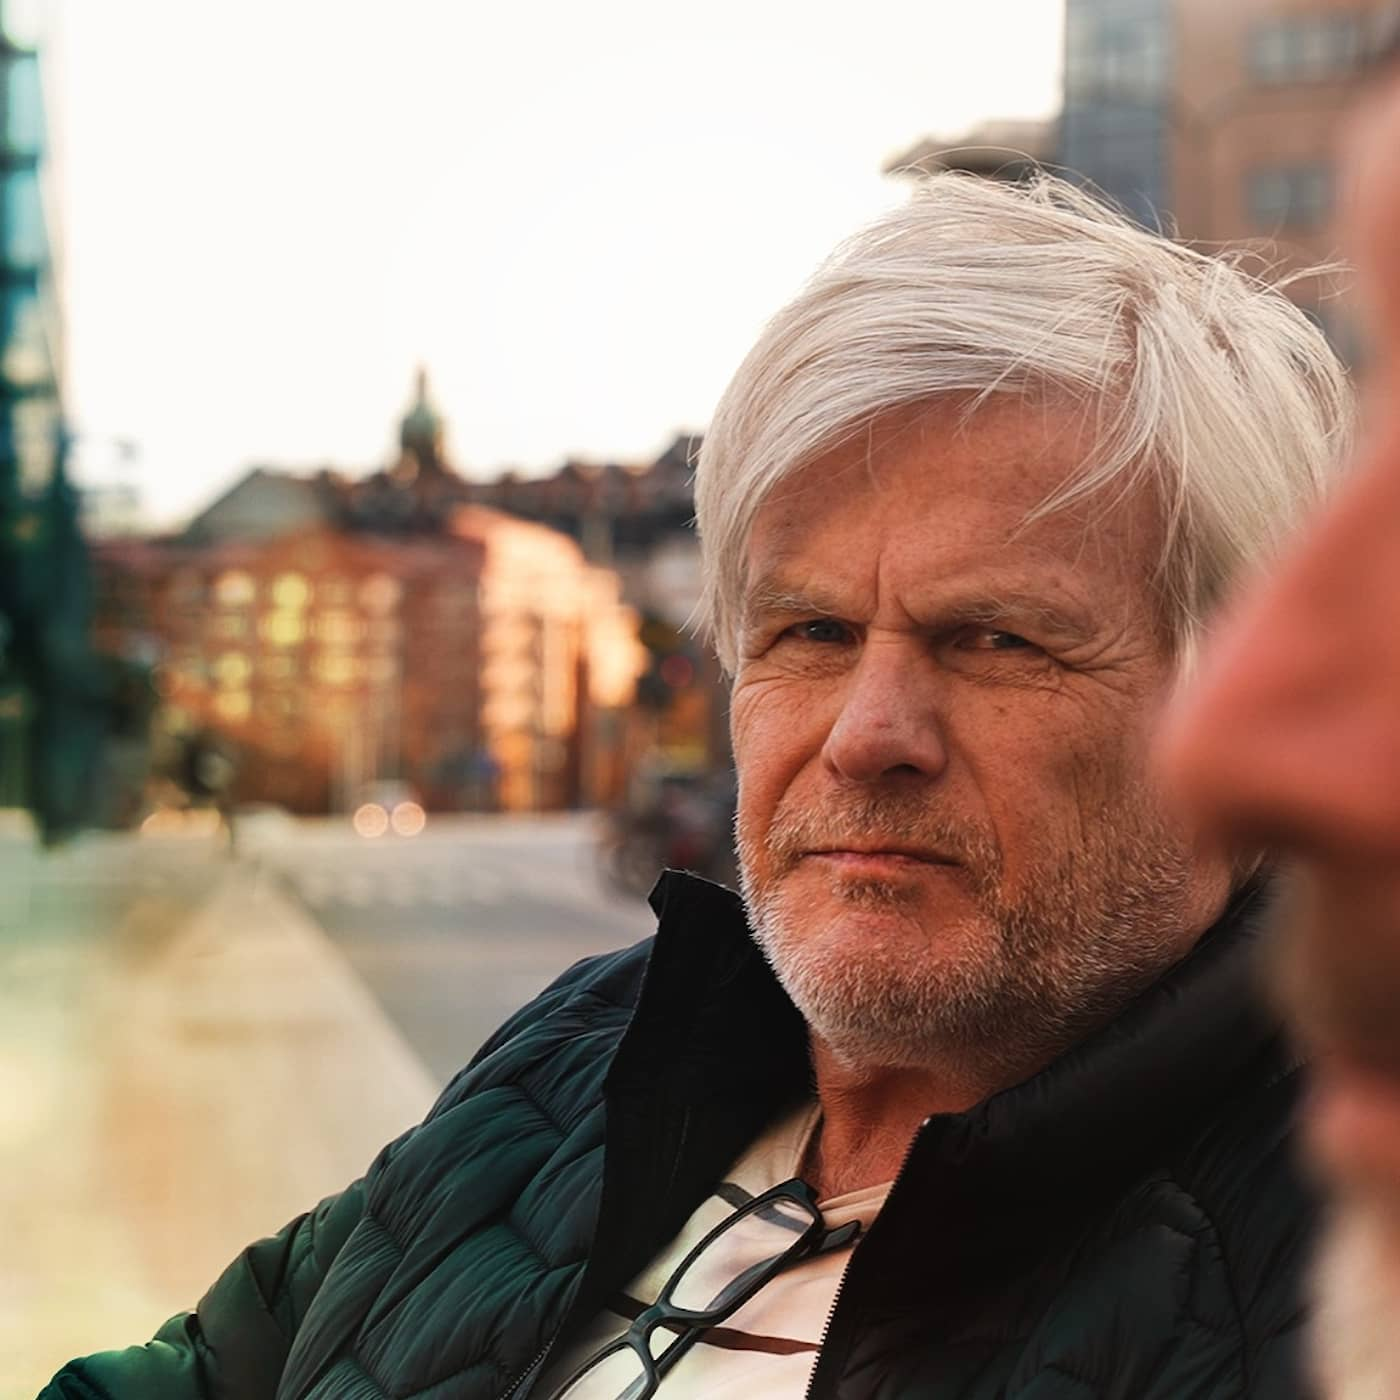 Hemlös i Stockholms city